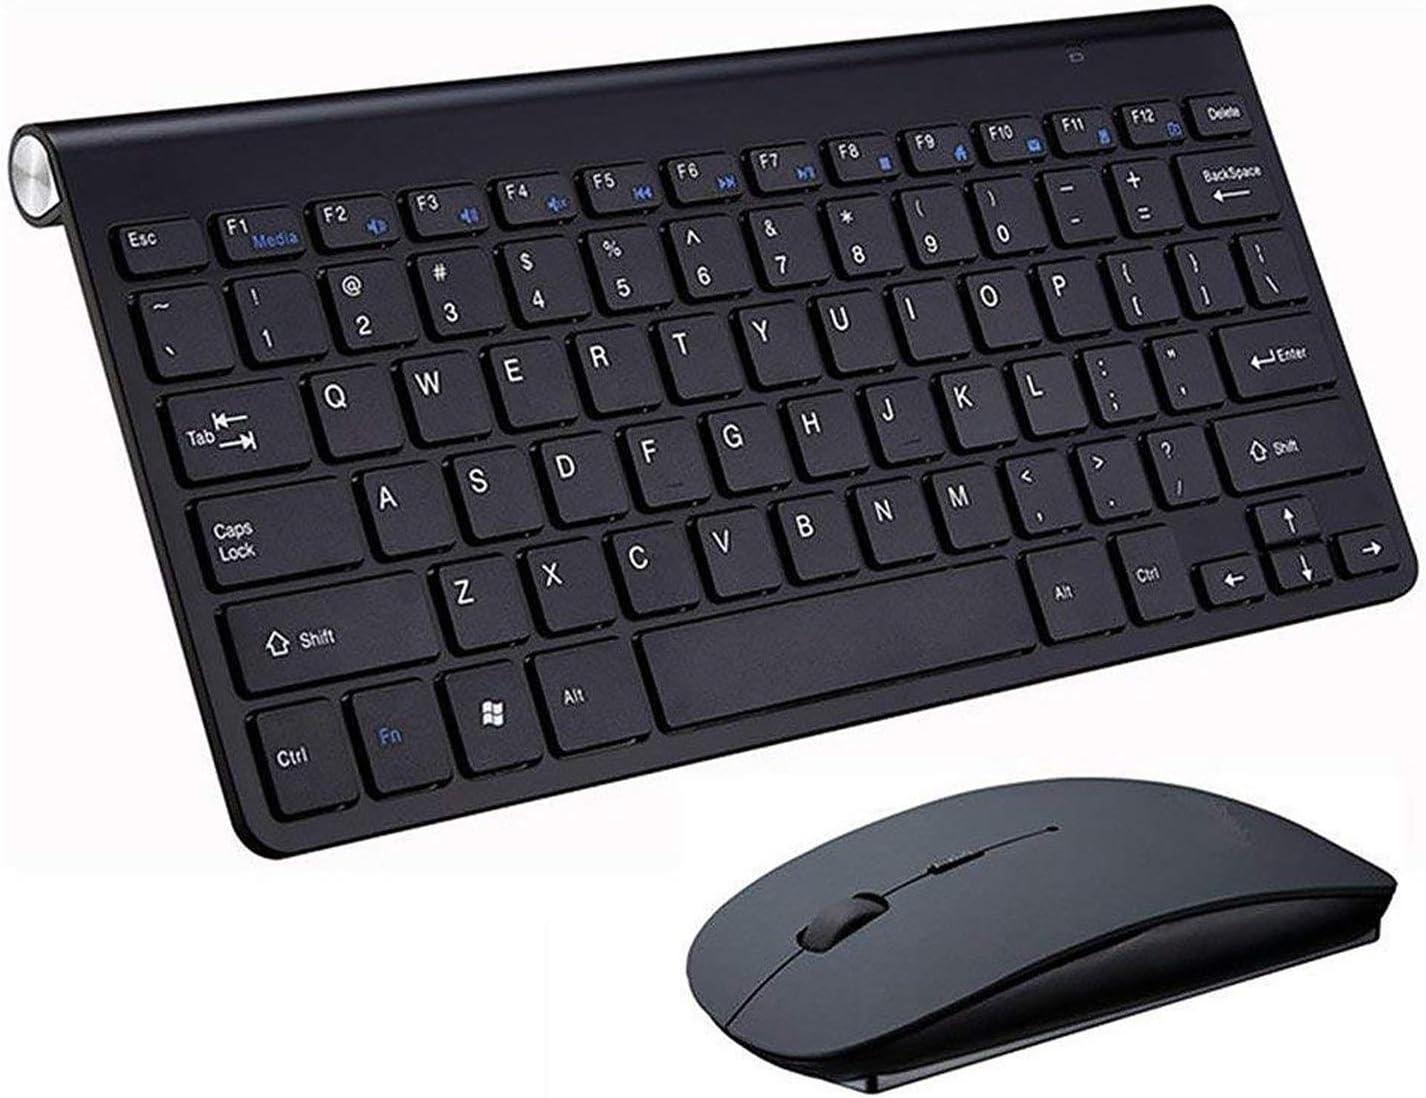 Xiaohu Gaming Keyboard Laptops X Ranking TOP16 latest Architecture Wireless